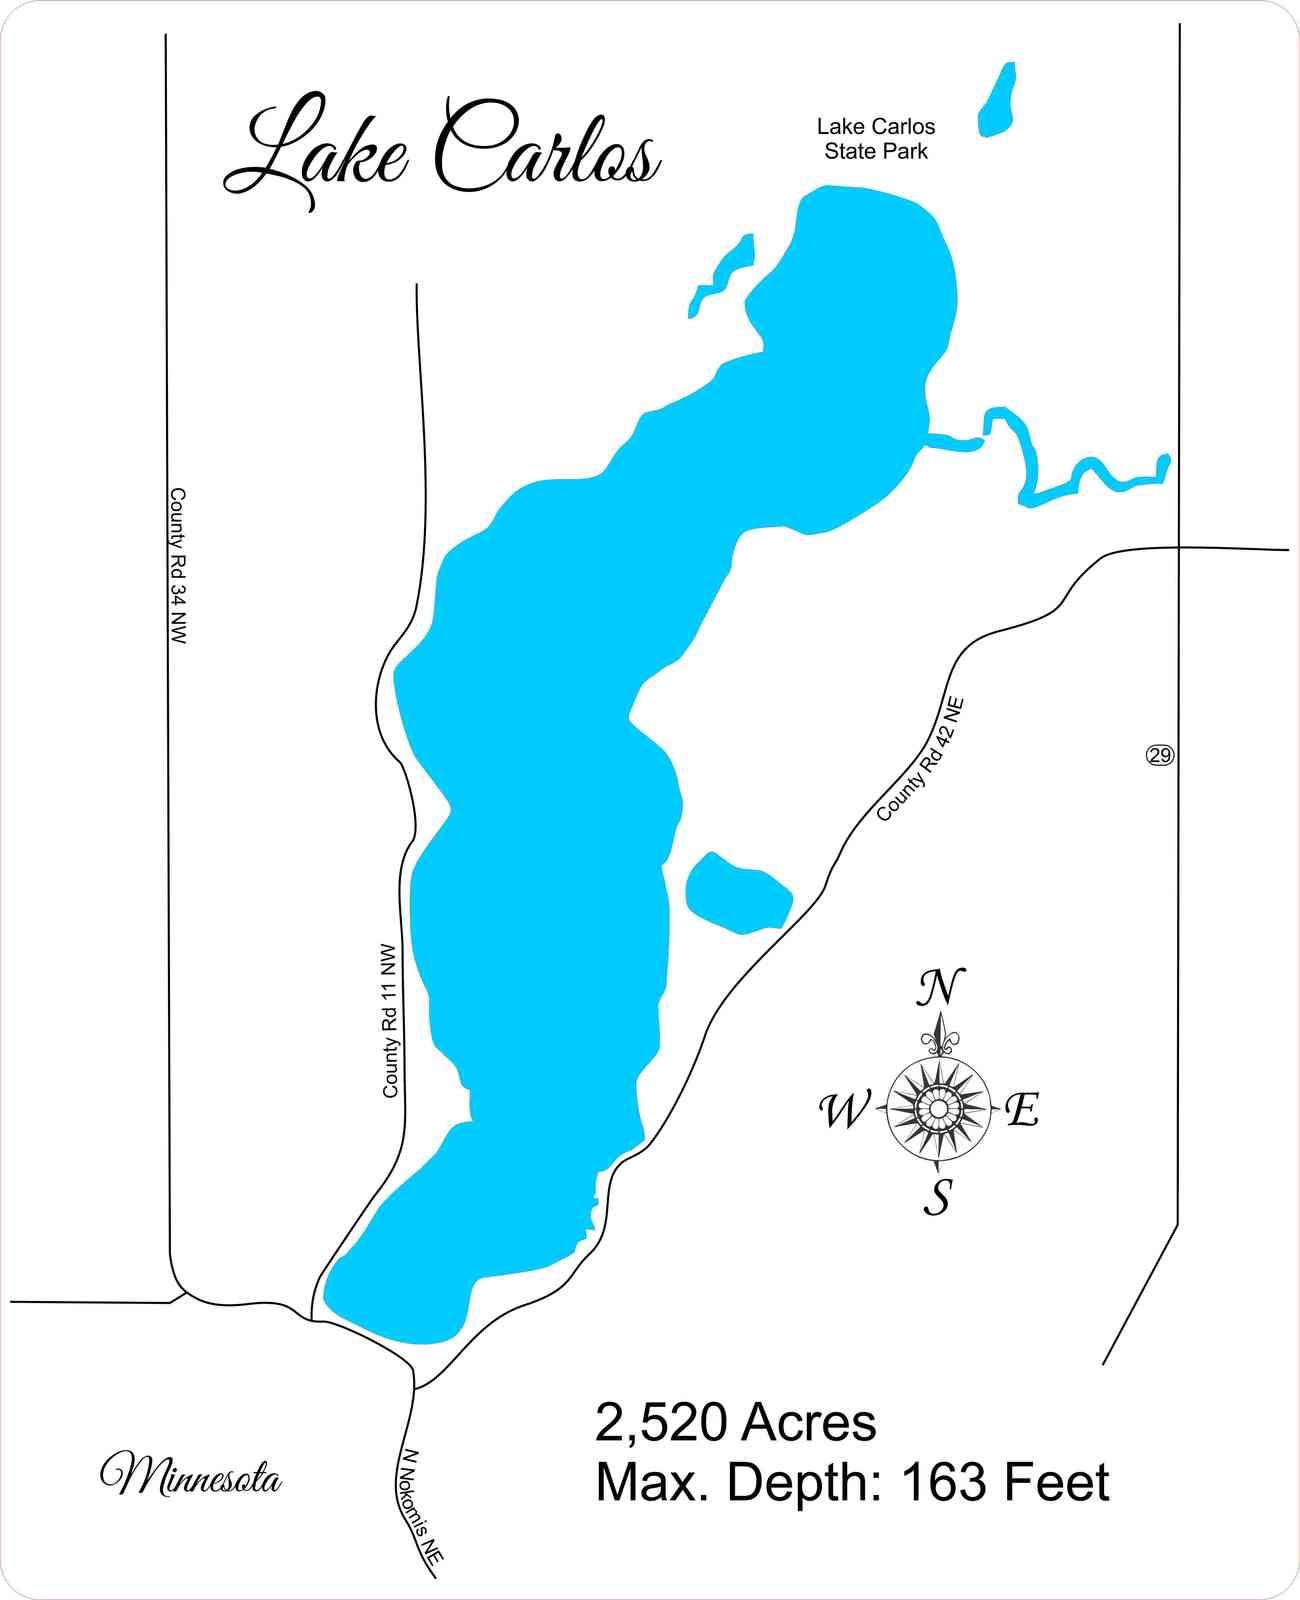 Personalized - Lake Carlos, Minnesota - Wood and 19 similar items on